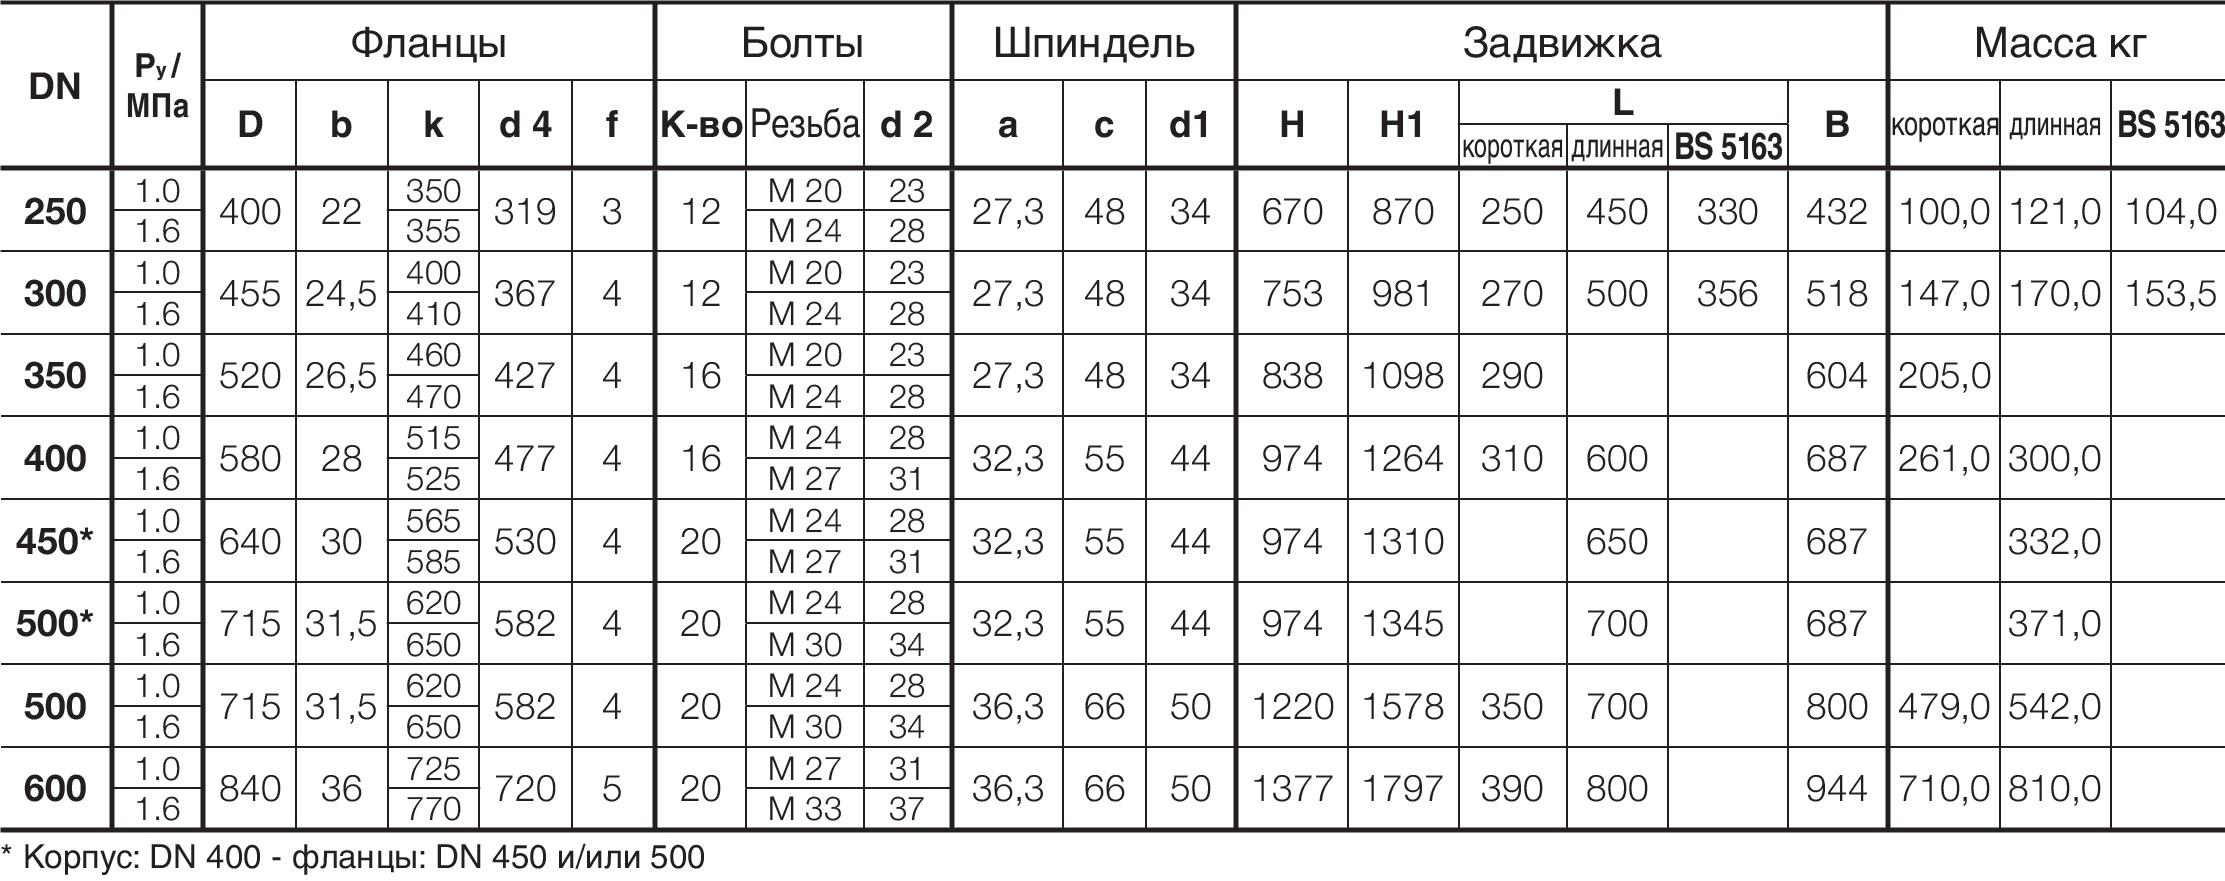 Таблица характеристик для Задвижка клиновая чугунная фланцевая Hawle 4000ELE2 (под электропривод) DN250 PN16